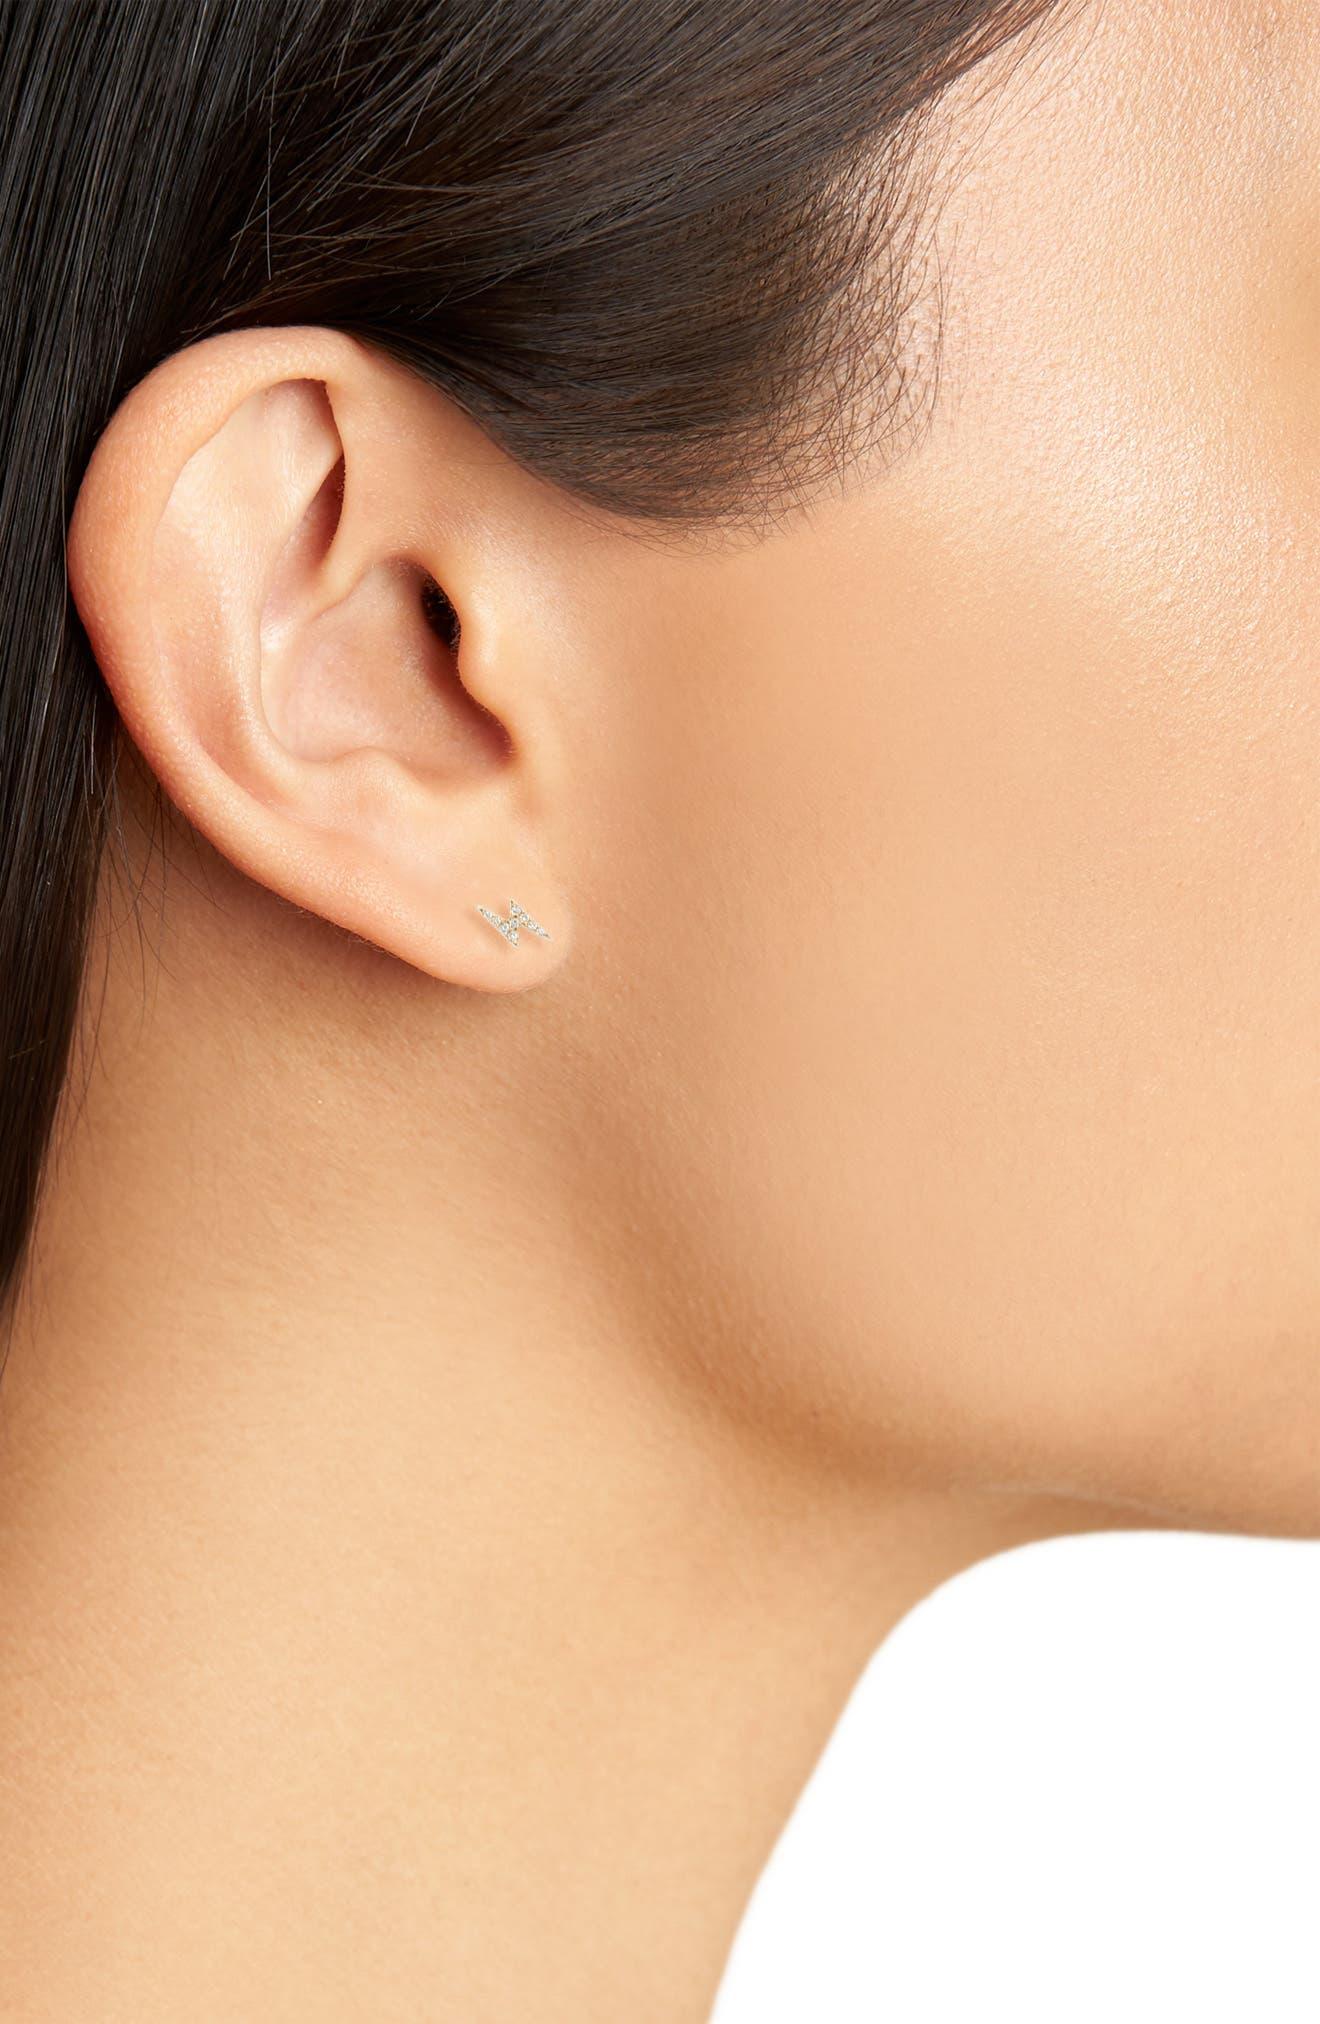 Diamond Stud Earrings,                             Alternate thumbnail 2, color,                             Yellow Gold